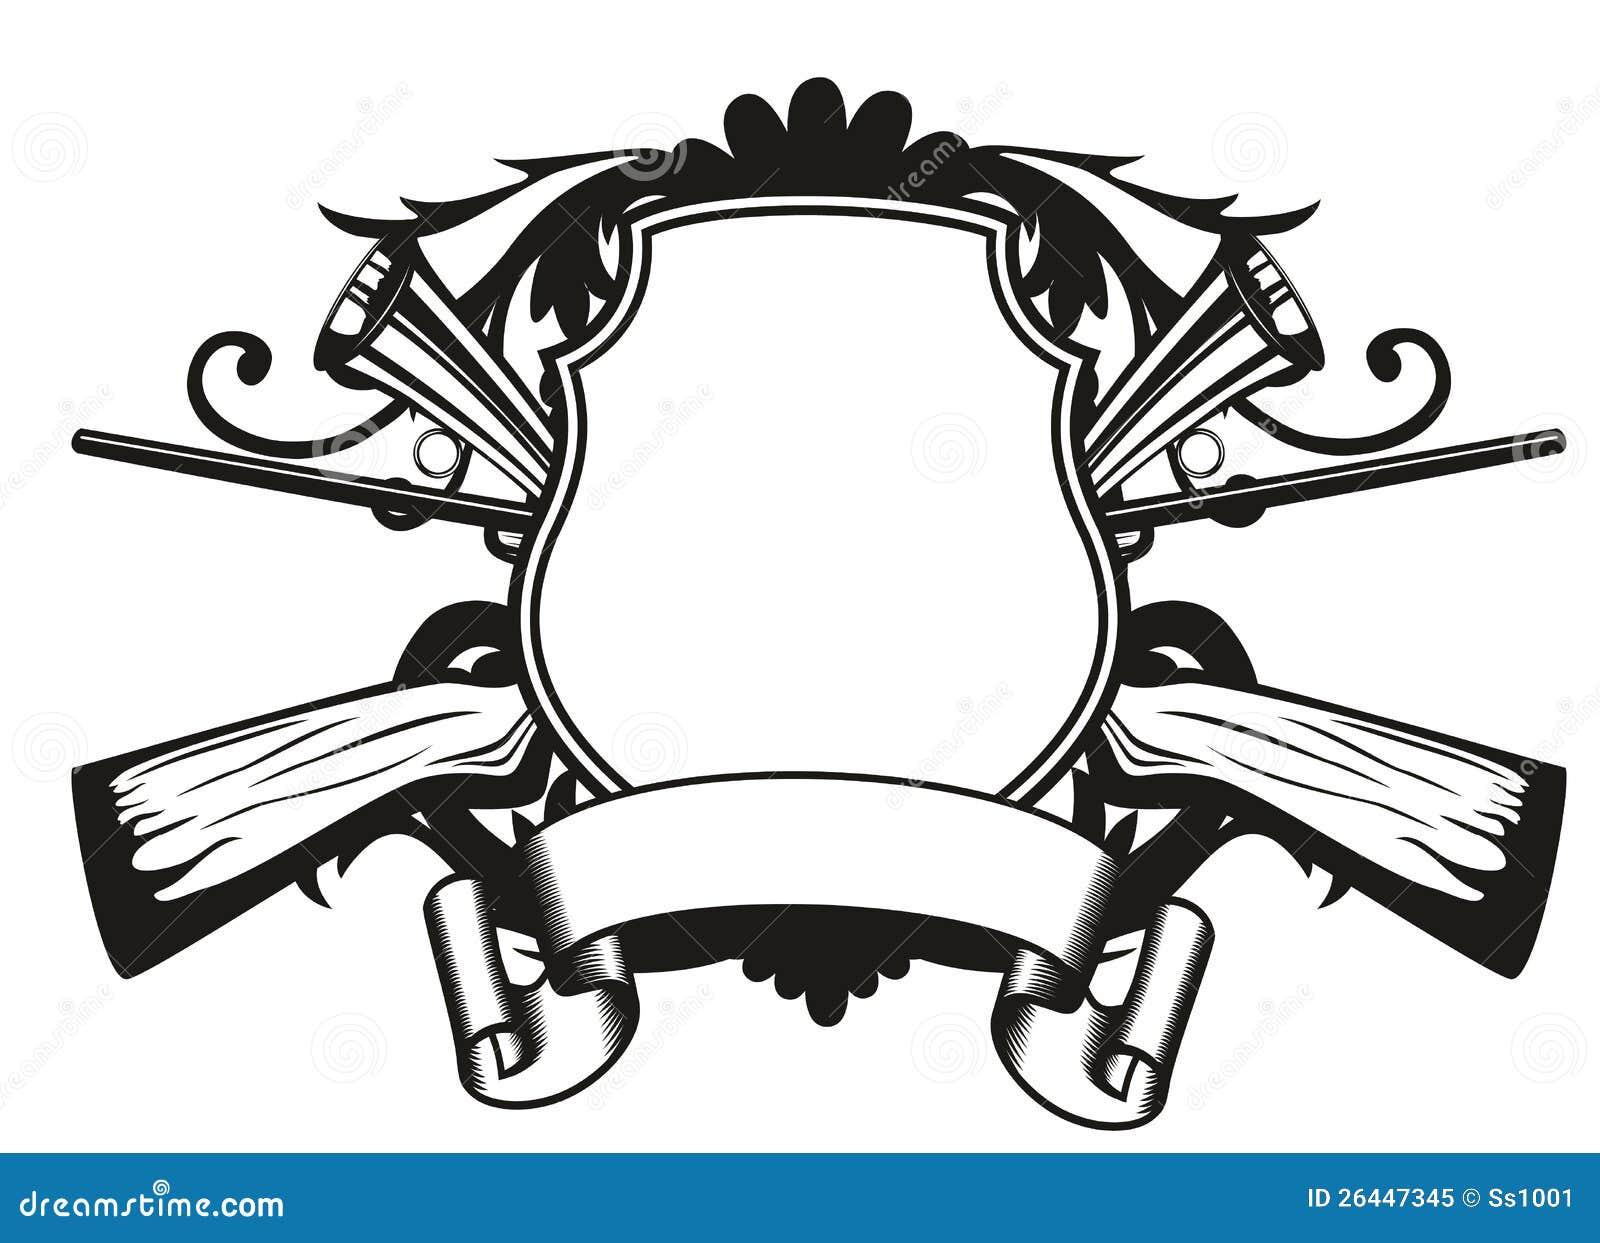 Frame hunting theme stock vector. Illustration of mammal - 26447345